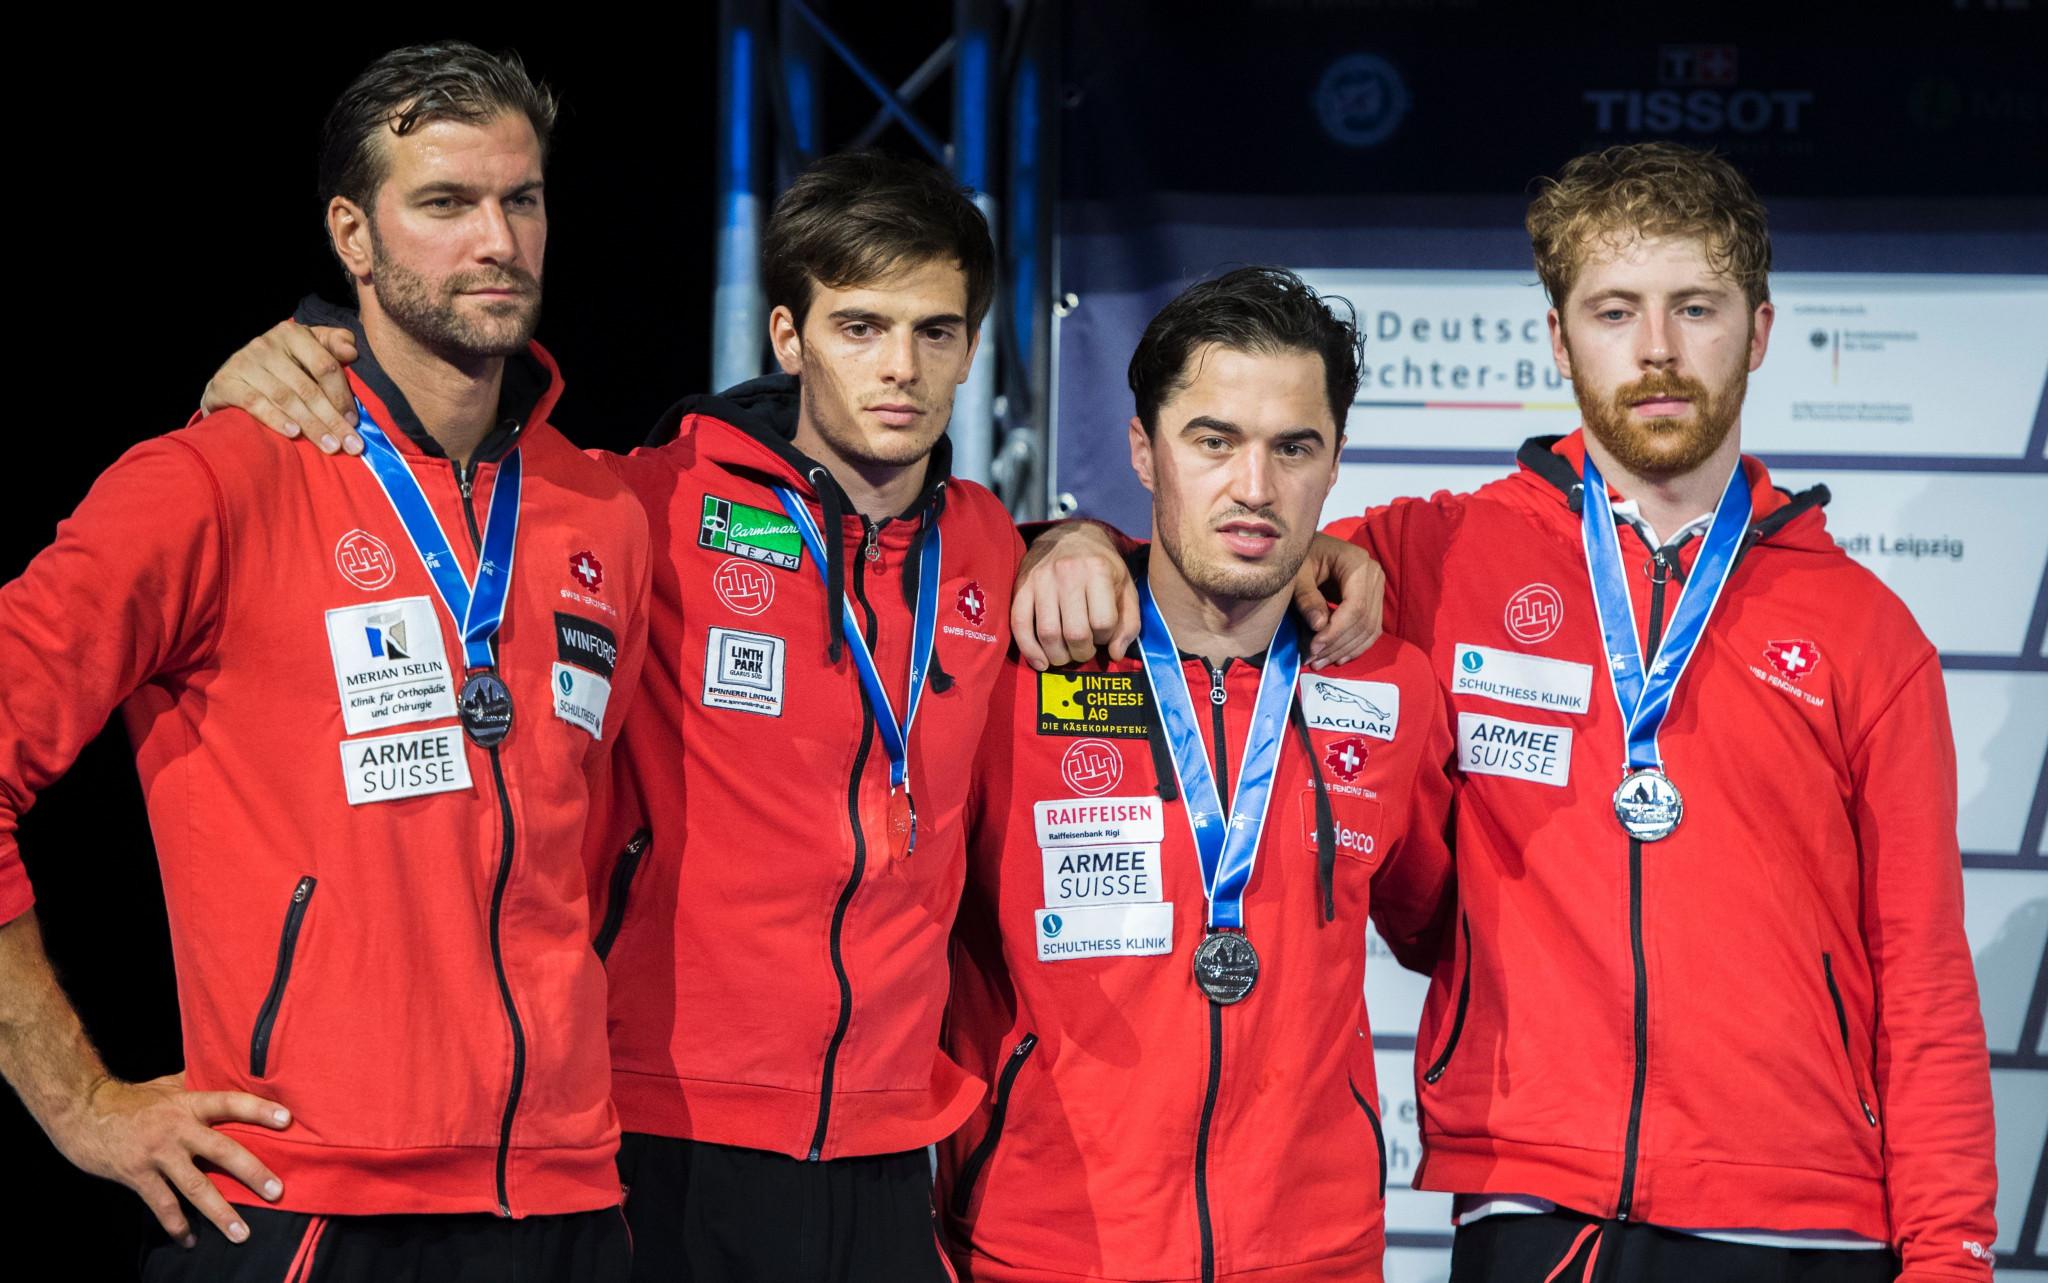 Switzerland beat hosts France to clinch team title at FIE Men's Épée World Cup